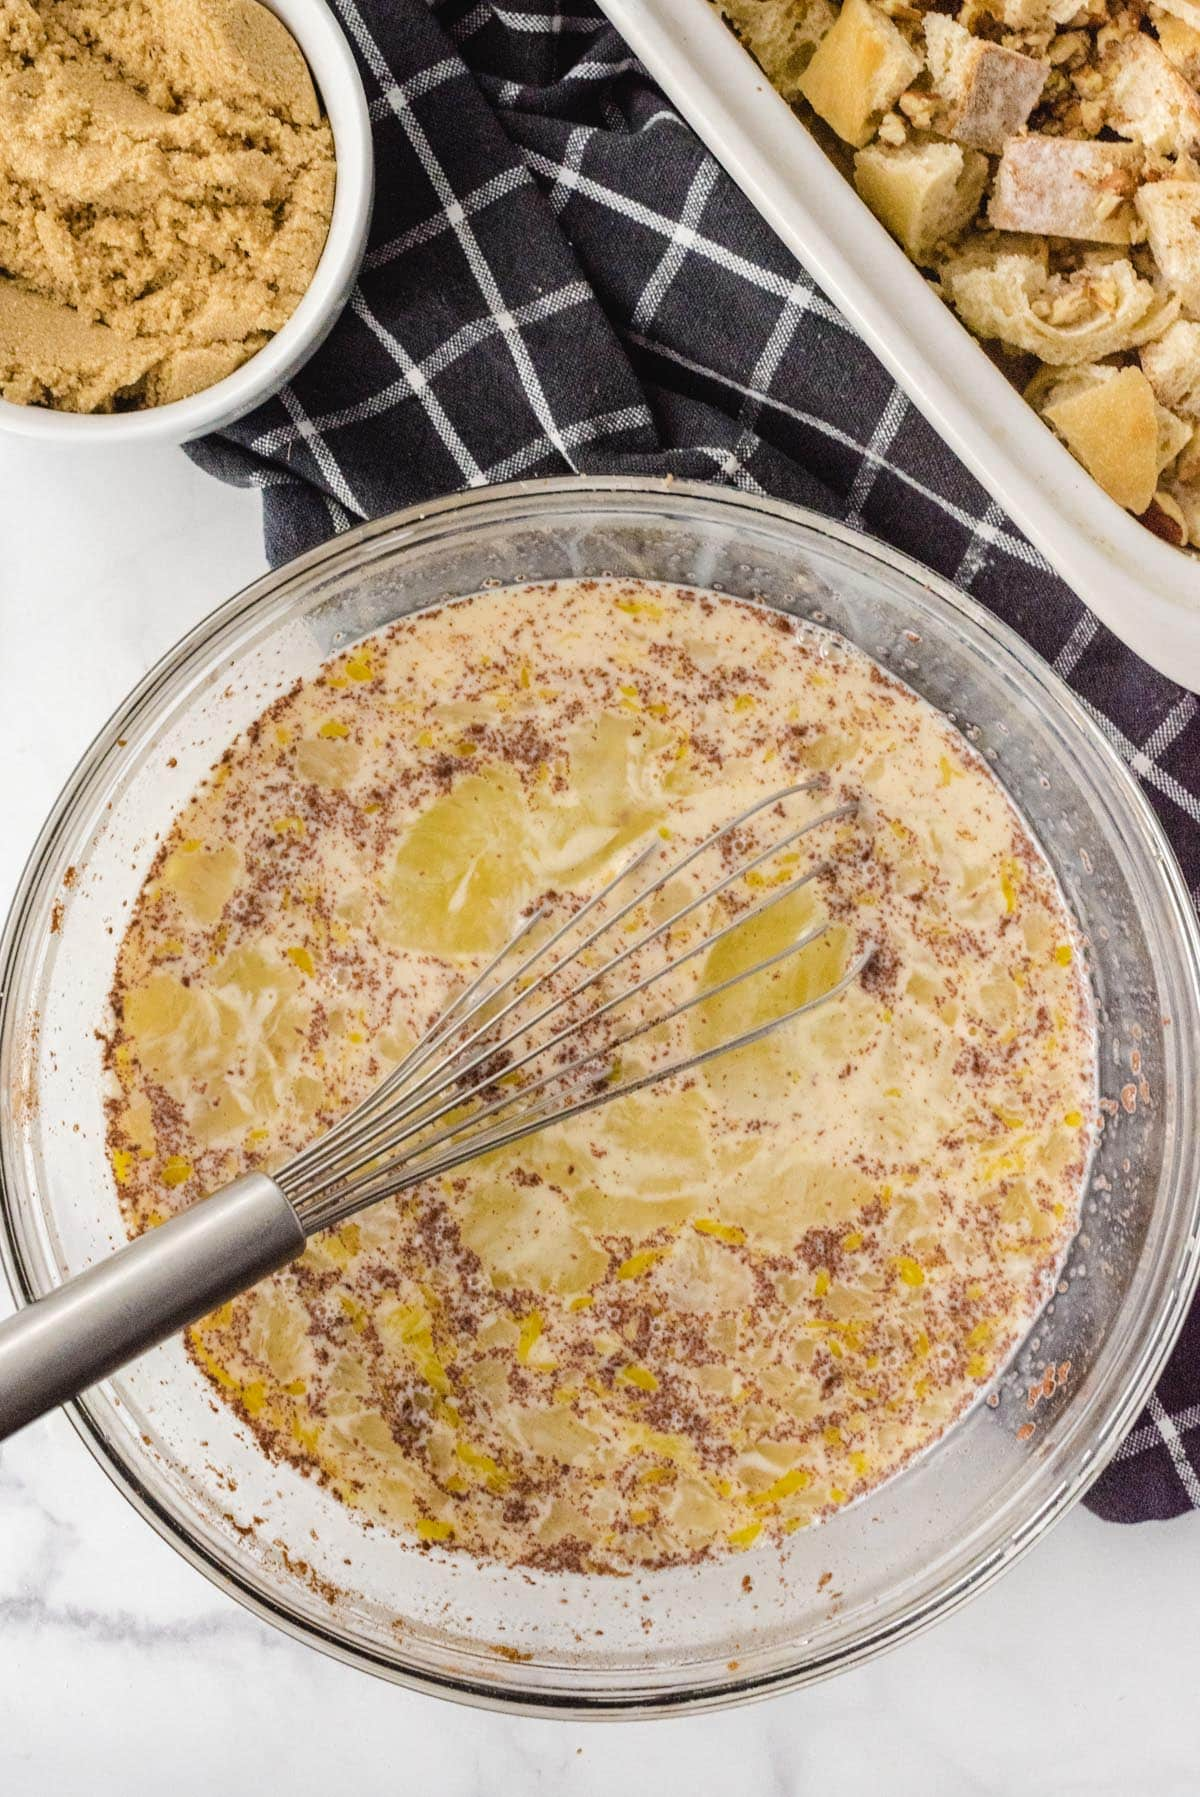 Whisk eggs, whole milk, half and half, sugar, almond extract, cinnamon, salt, and allspice.